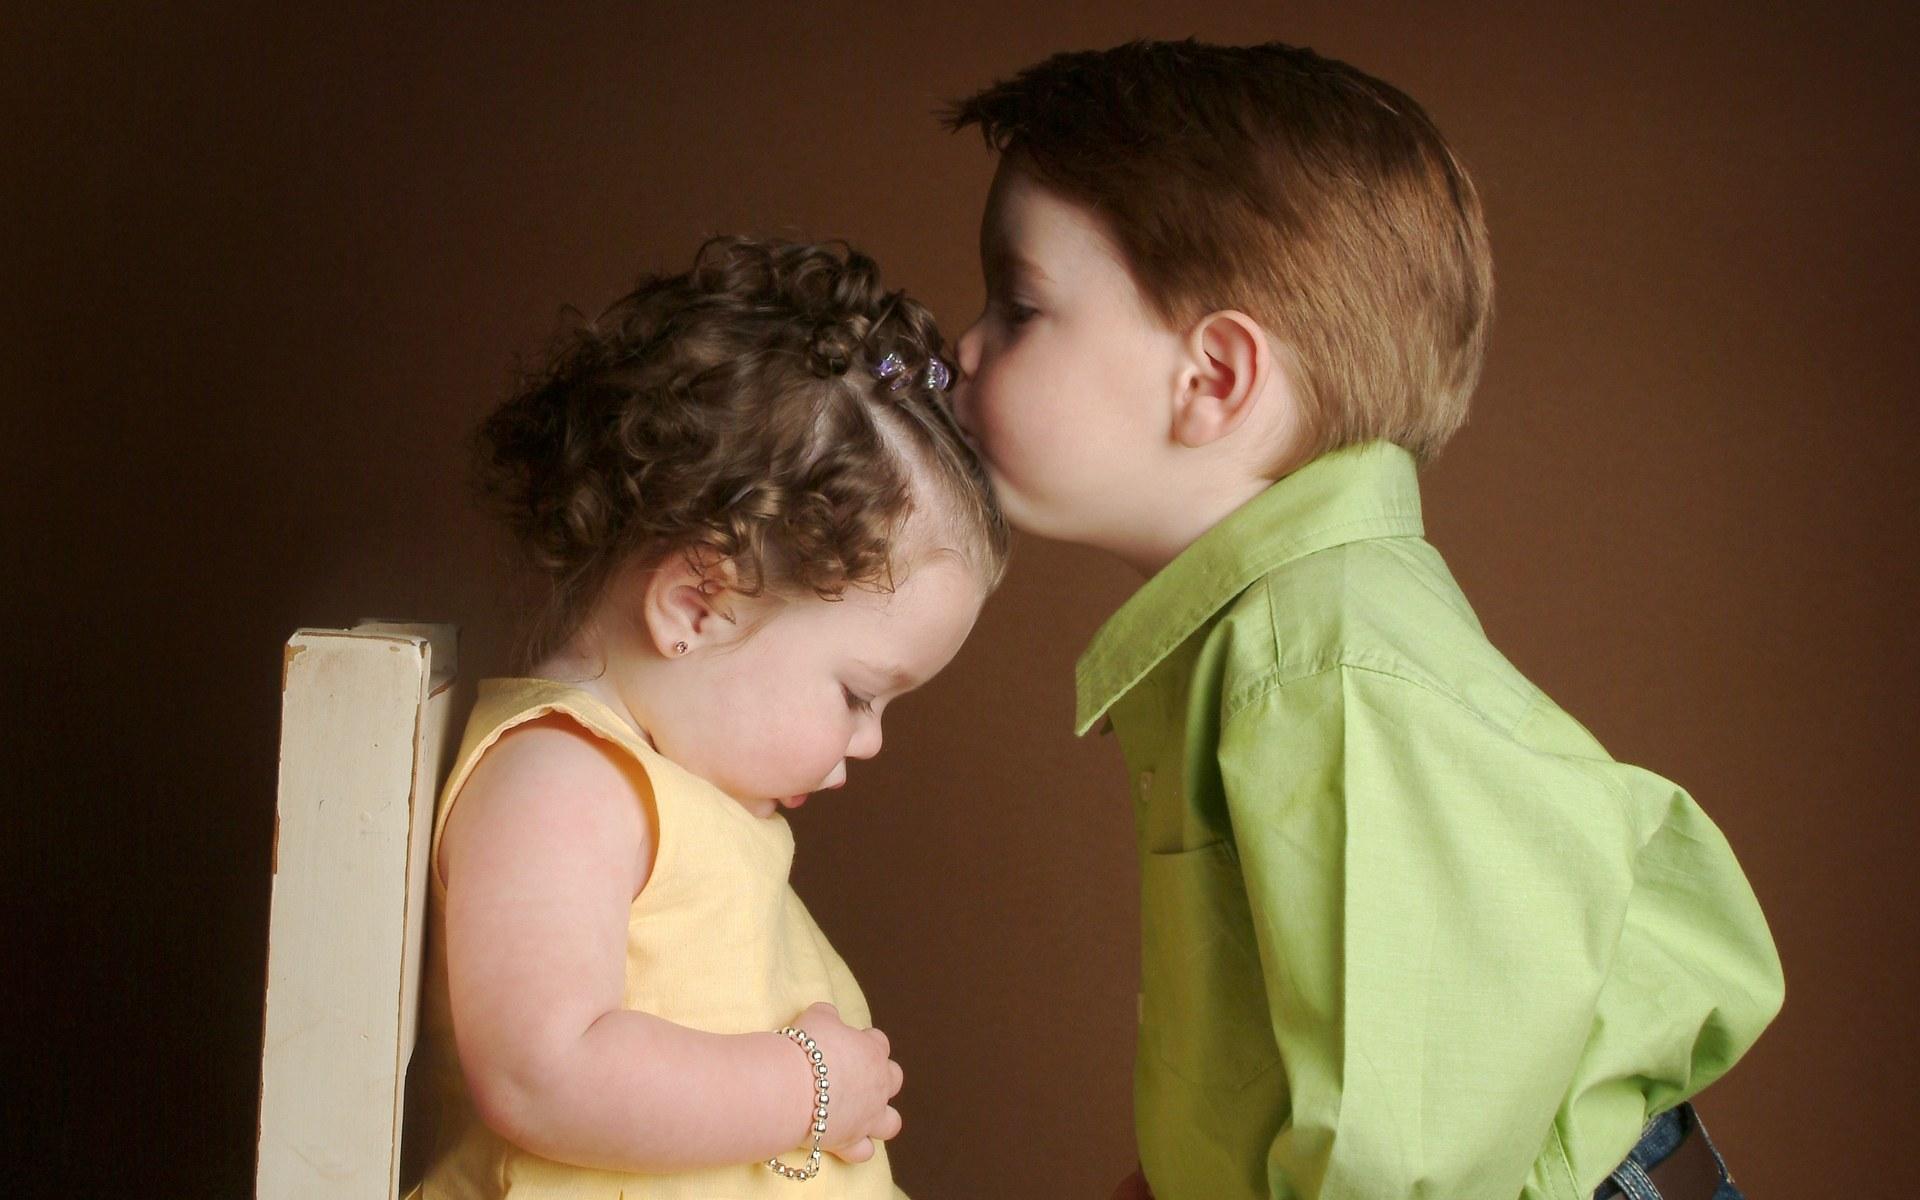 Девушки целуются (91 фото) Триникси 3